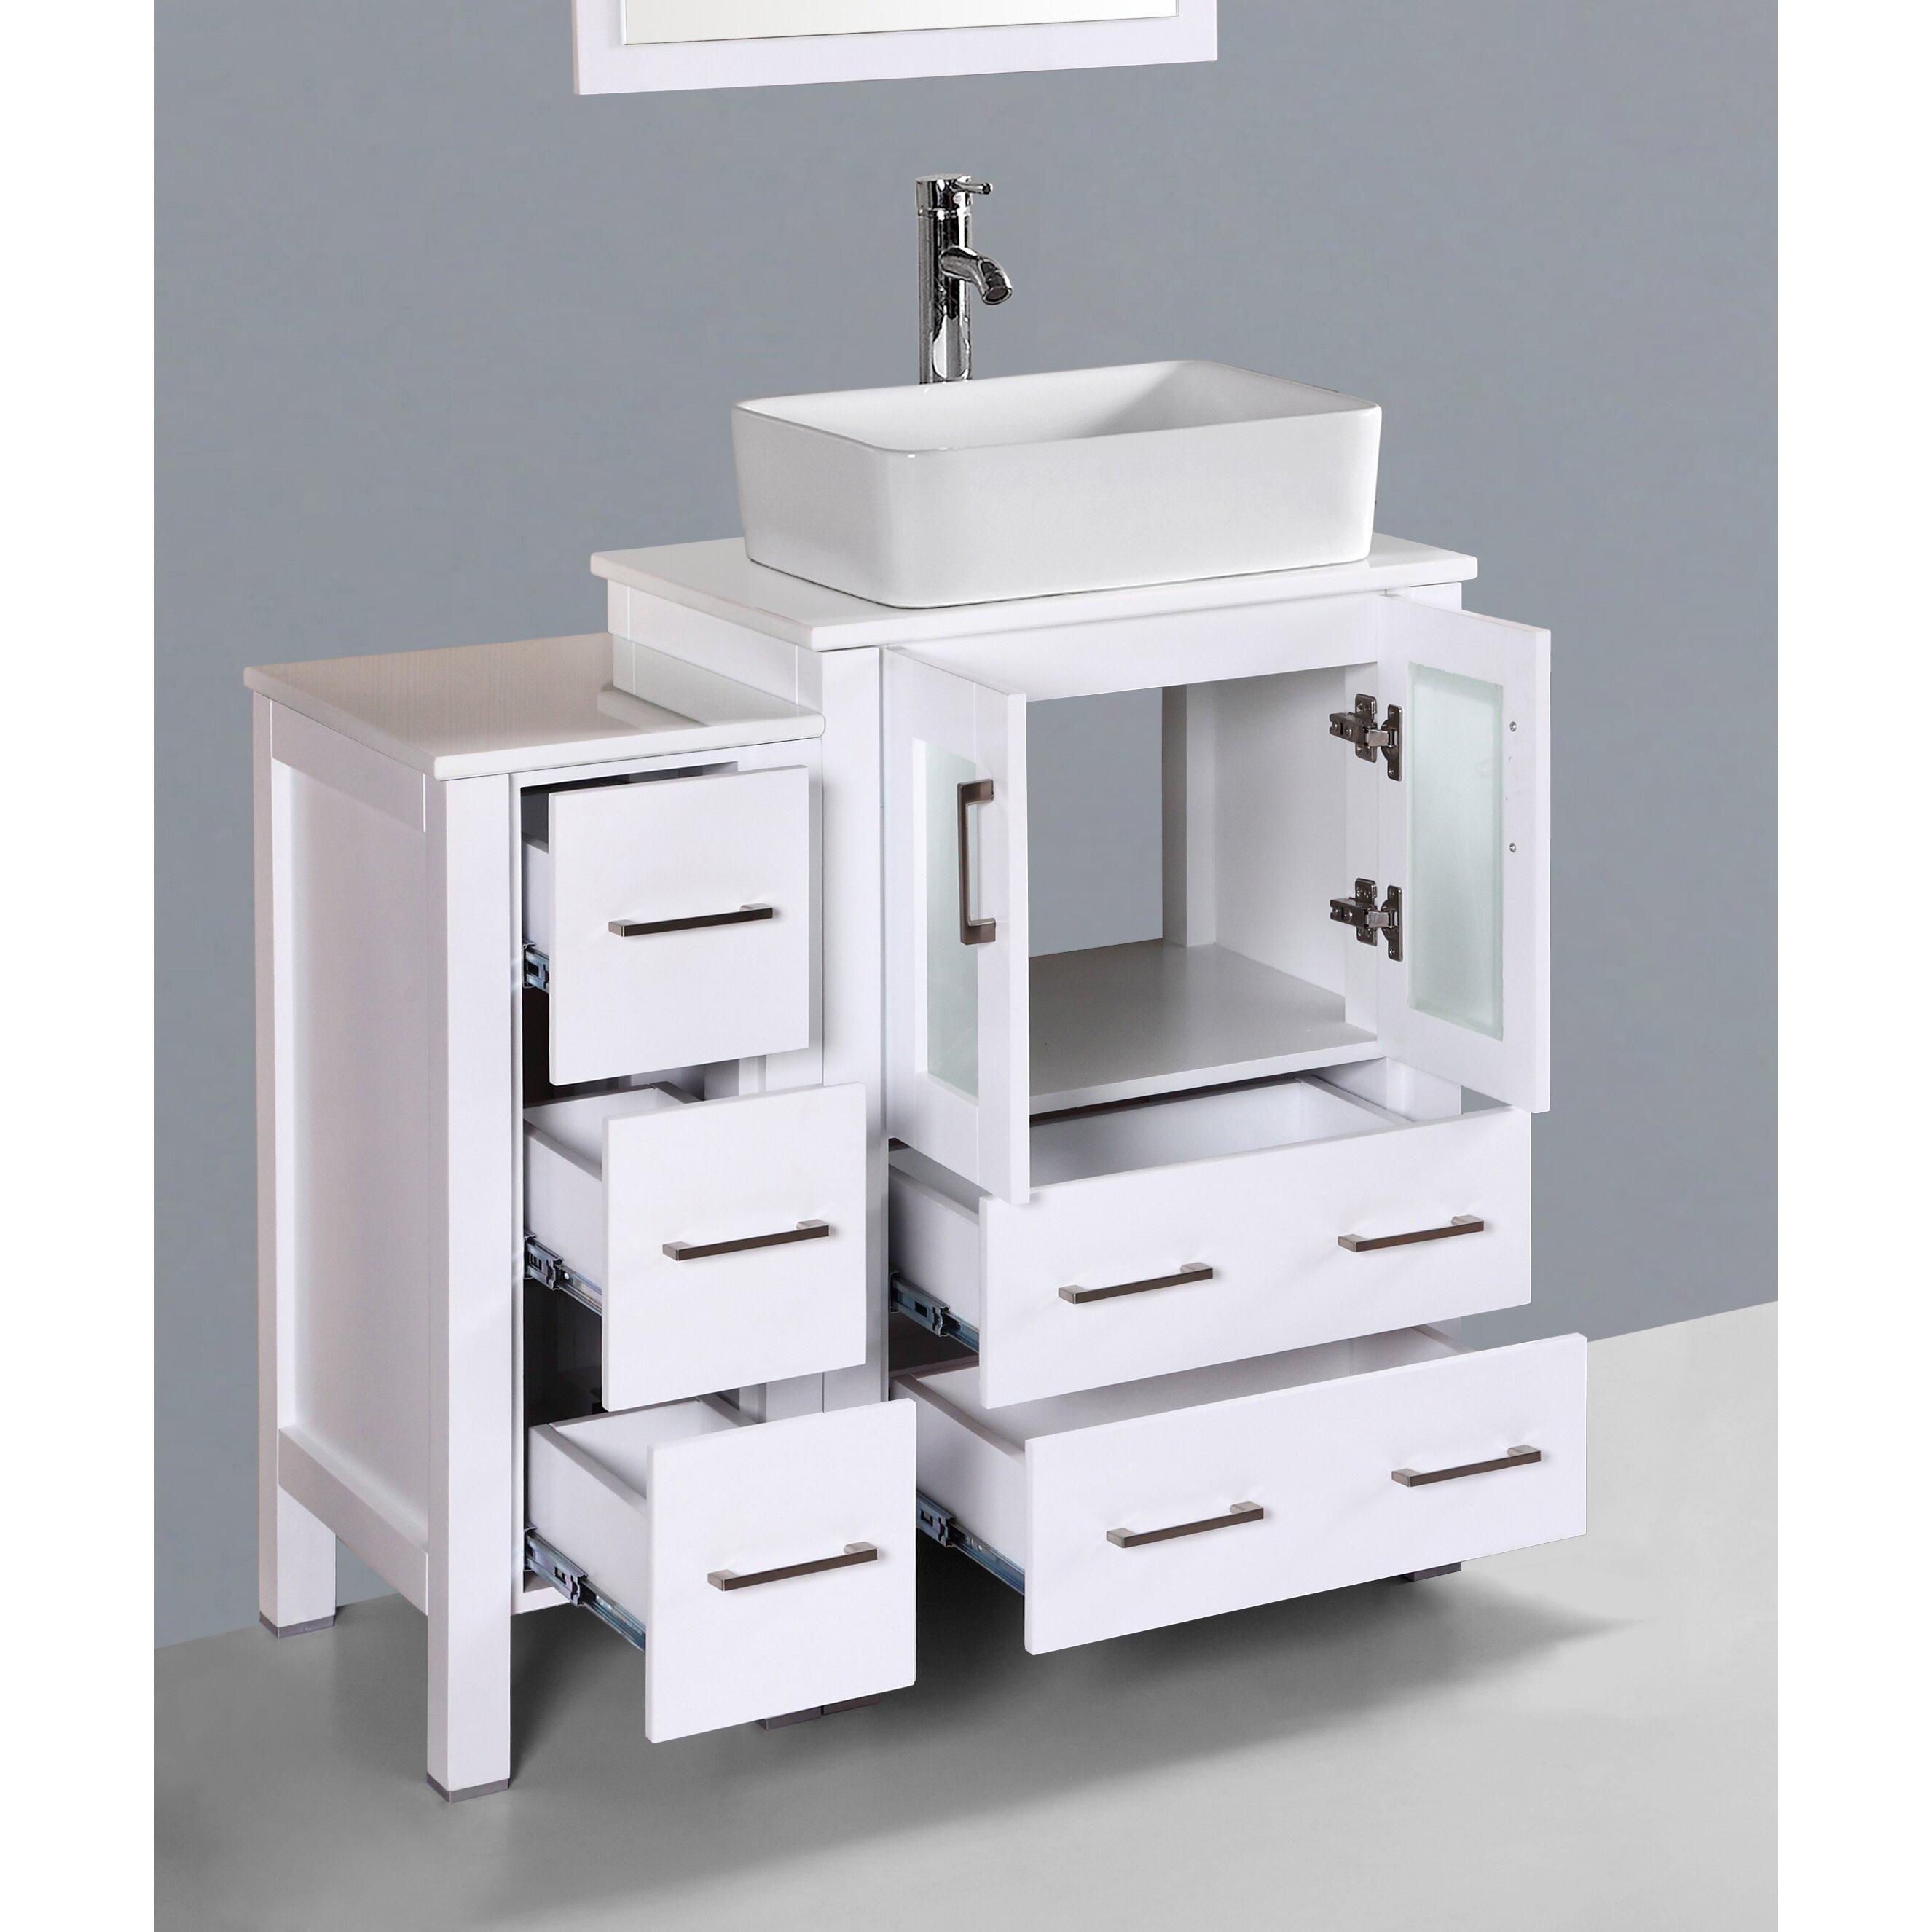 "Mirrored Bathroom Vanity Toronto: Wade Logan Brigantine 36"" Single Bathroom Vanity Set With"